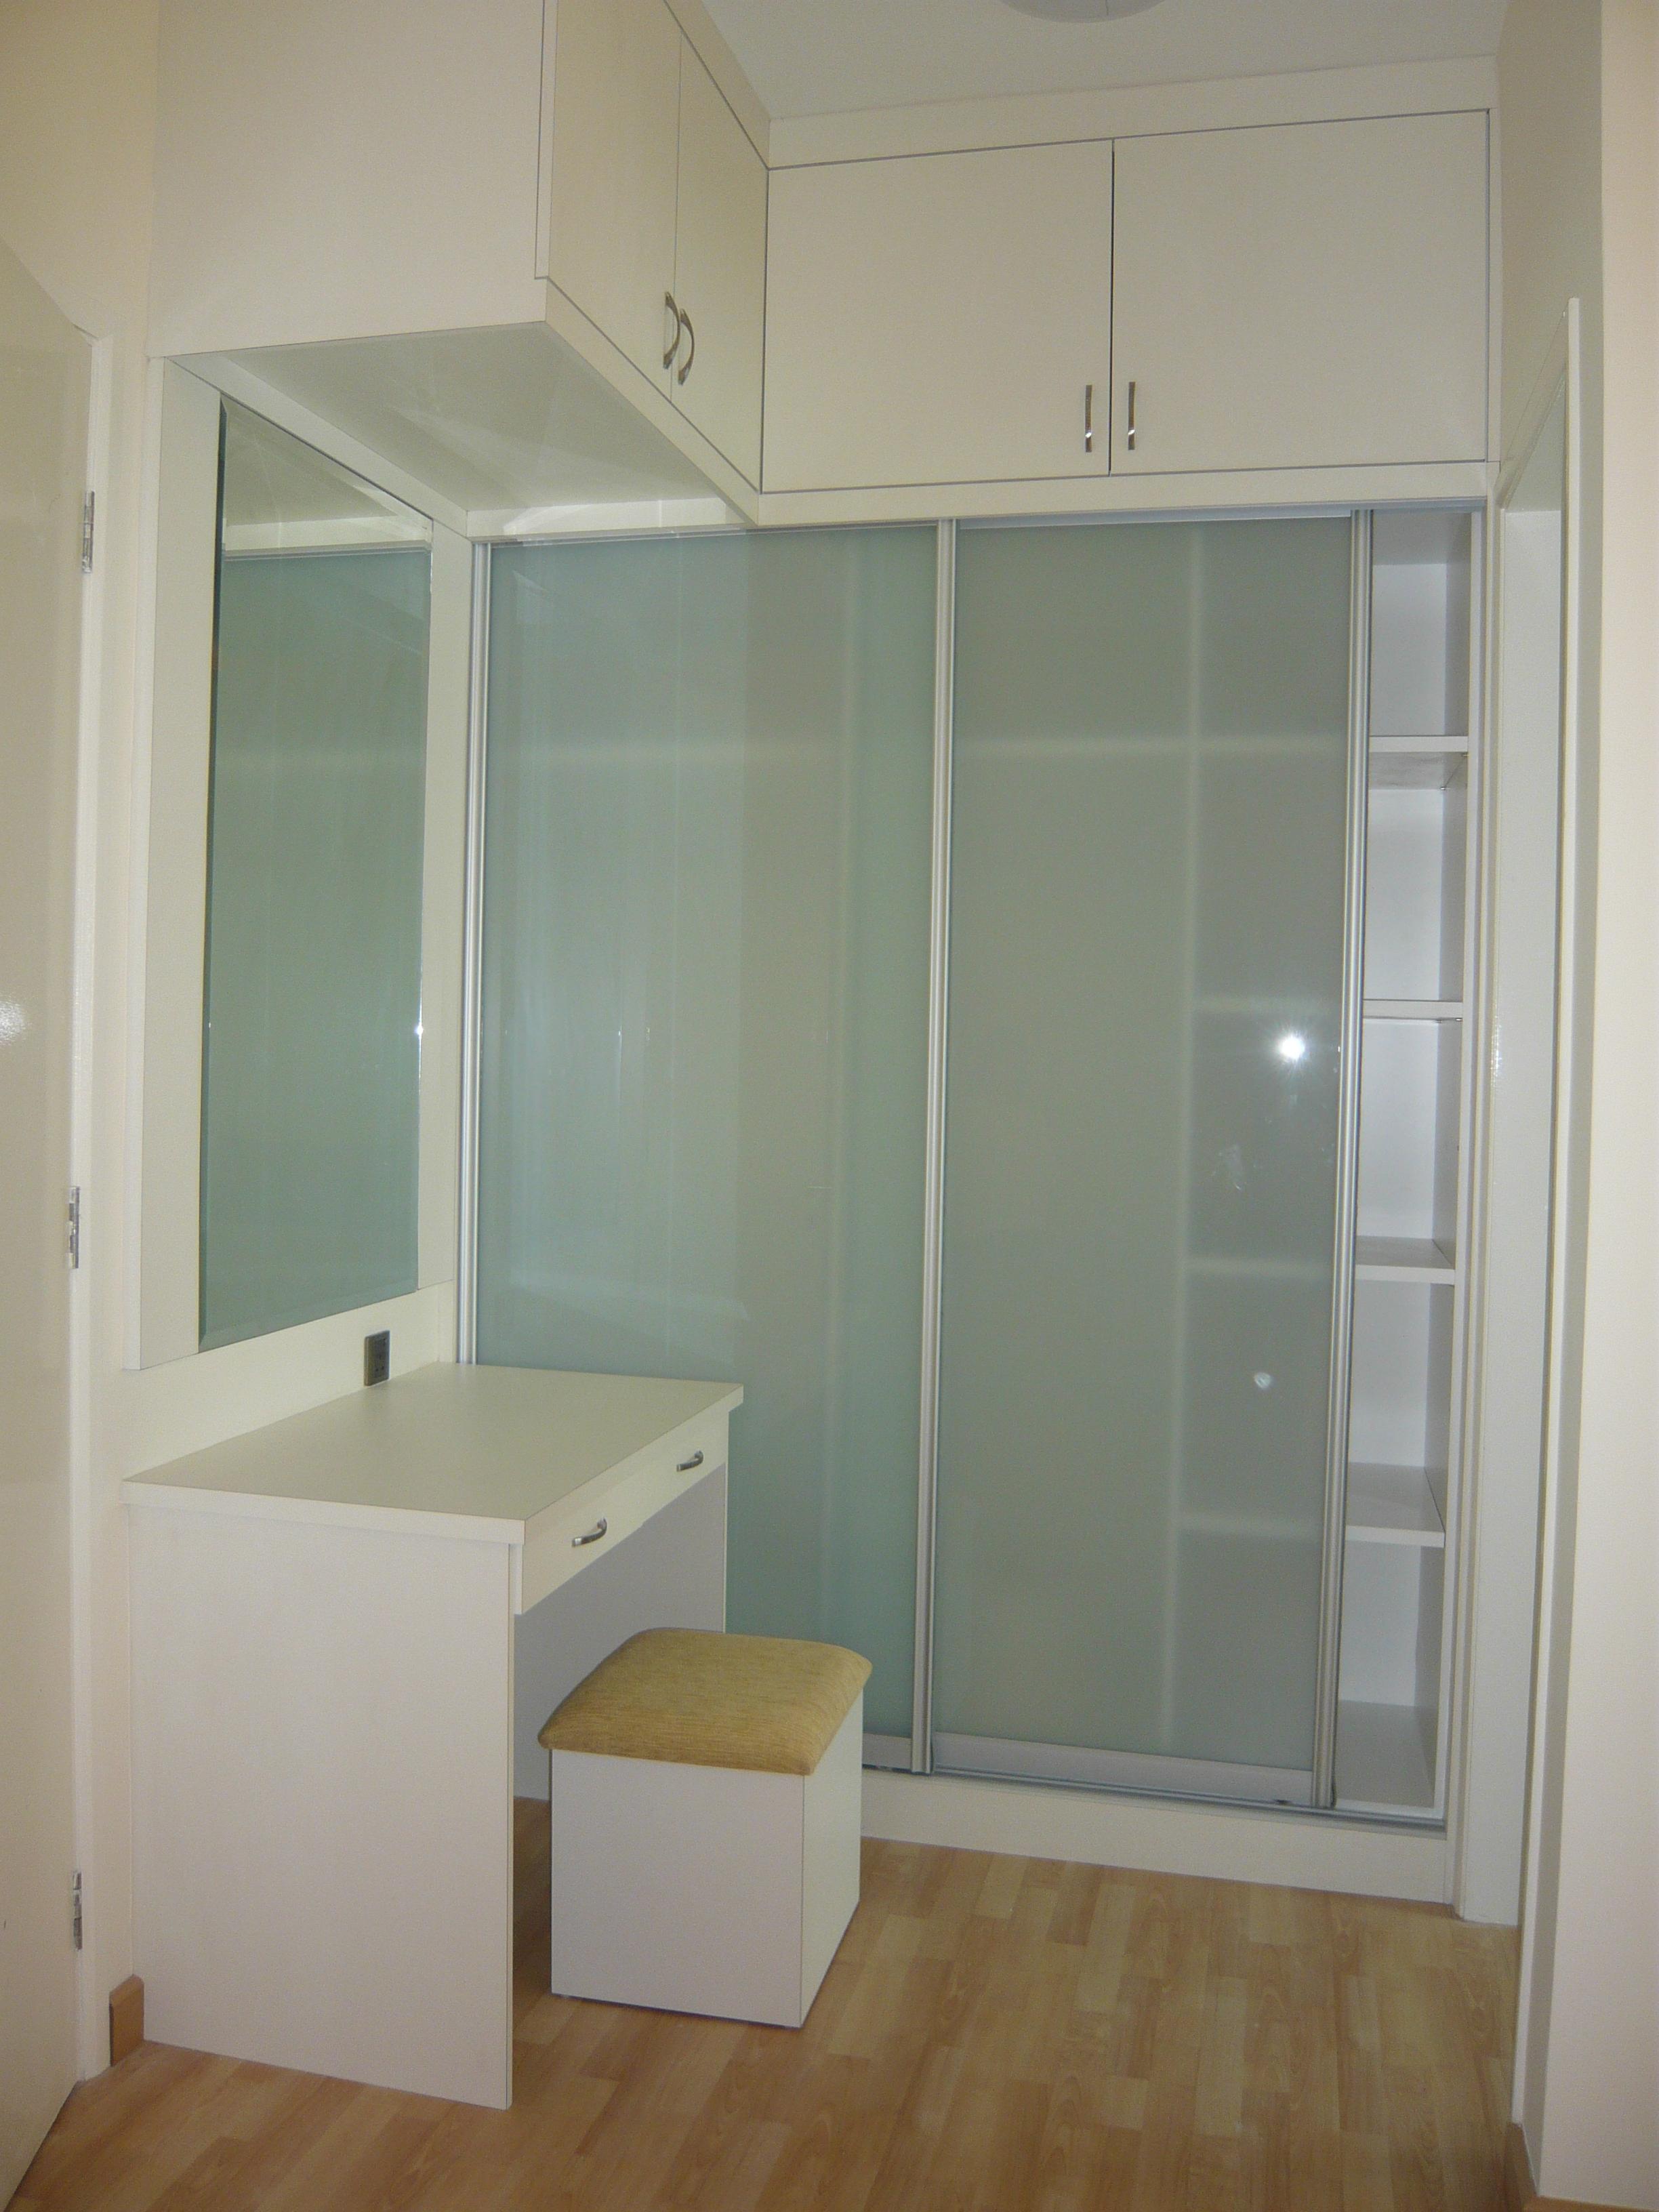 Wardrobe at  Amaya Saujana Condominium Subang Jaya Works